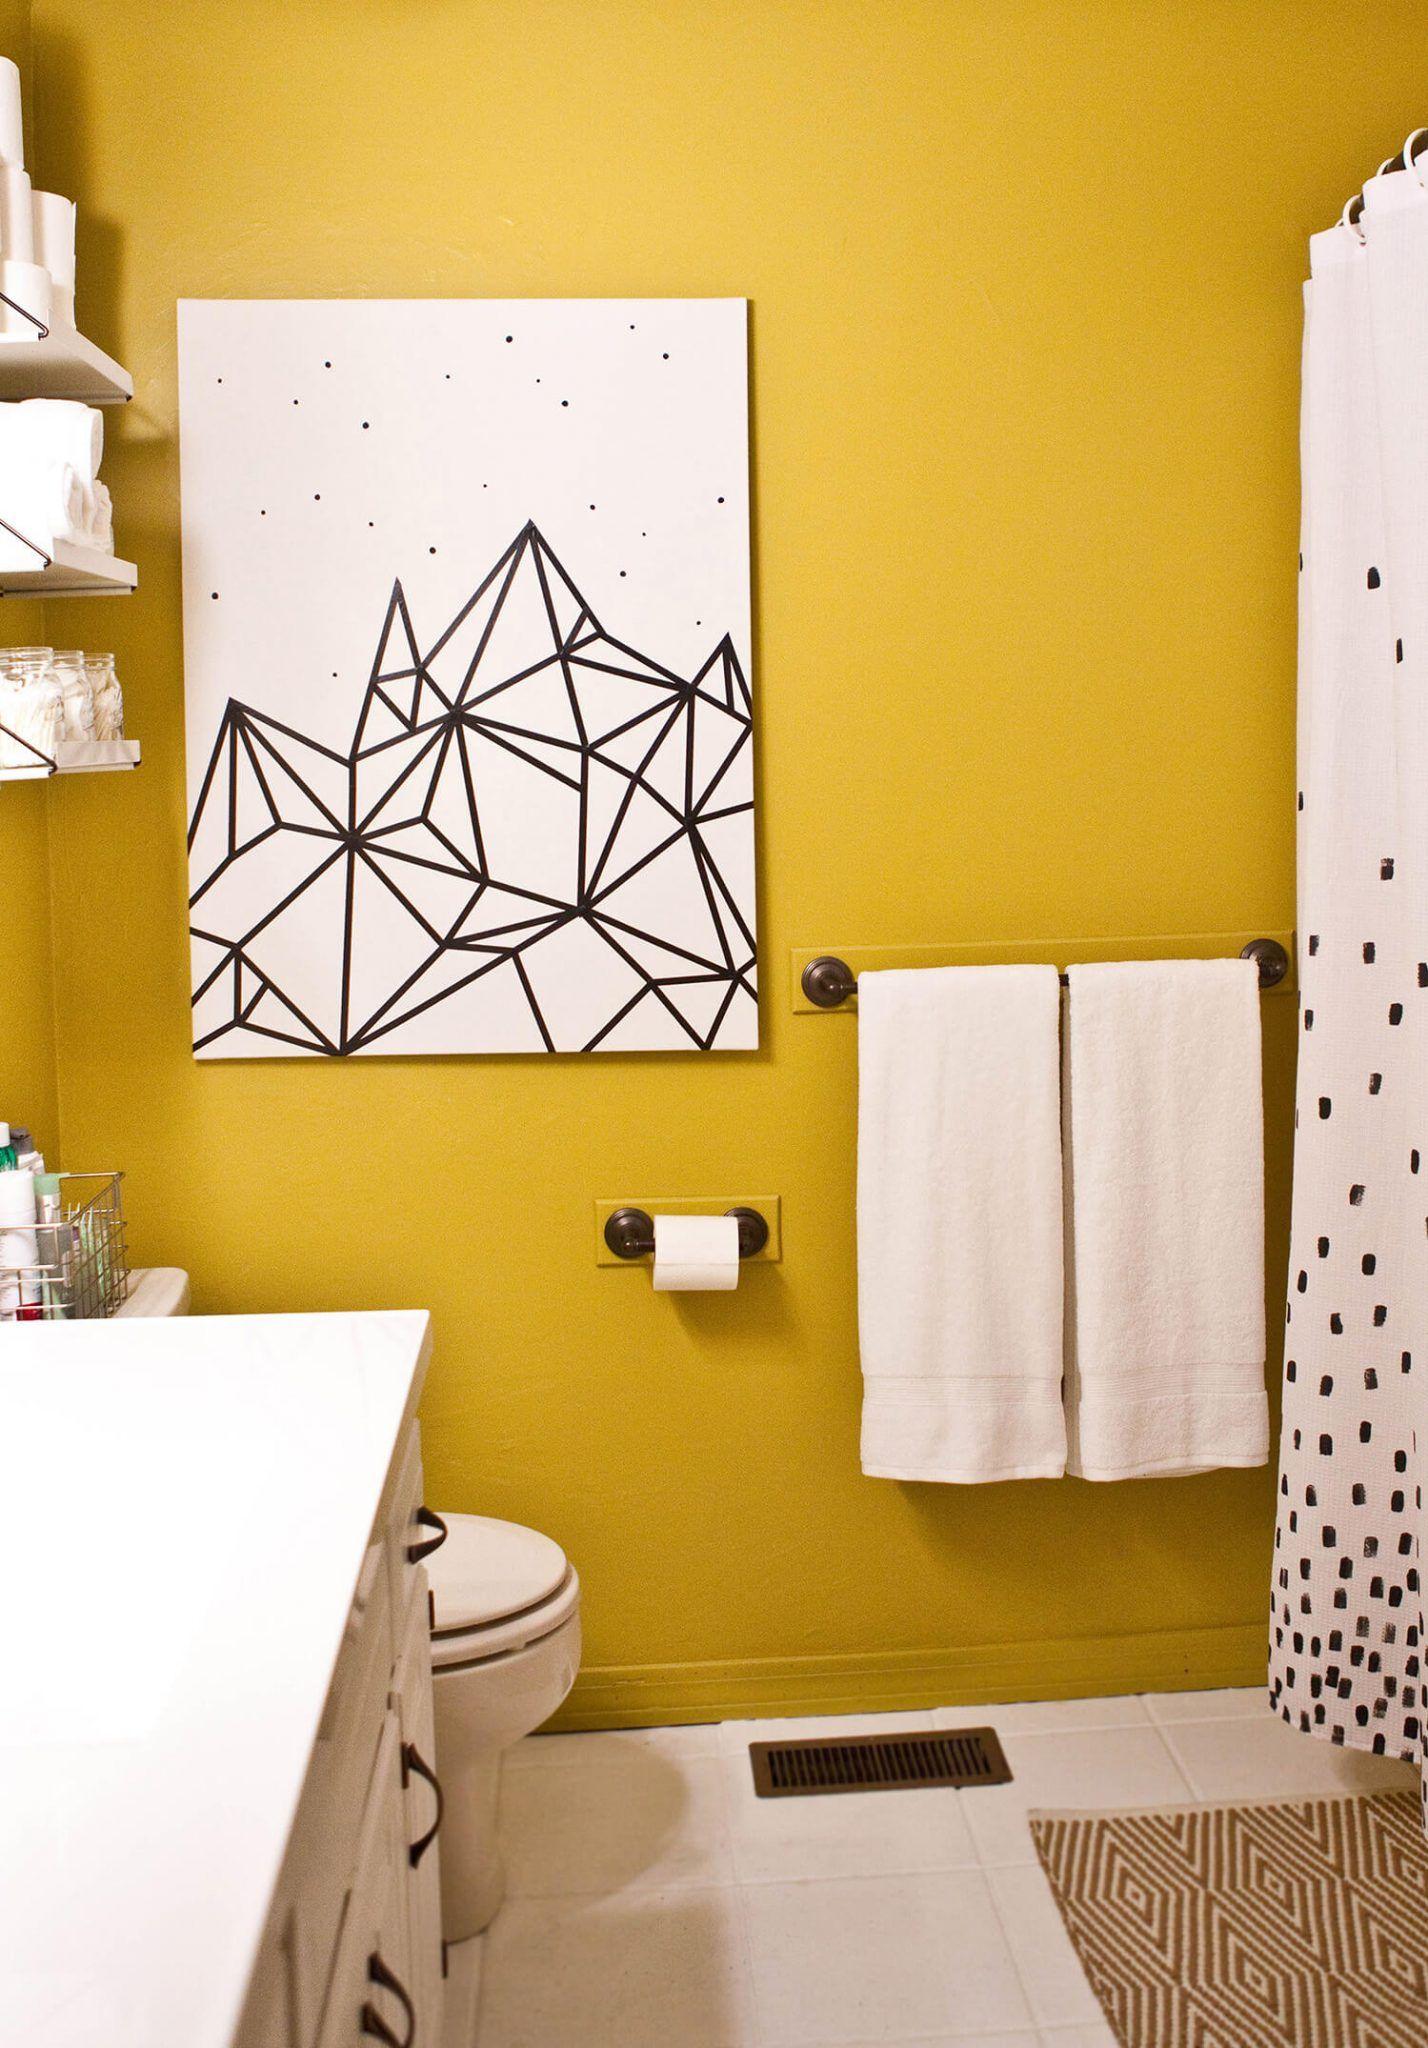 Washi tape geometric wall art